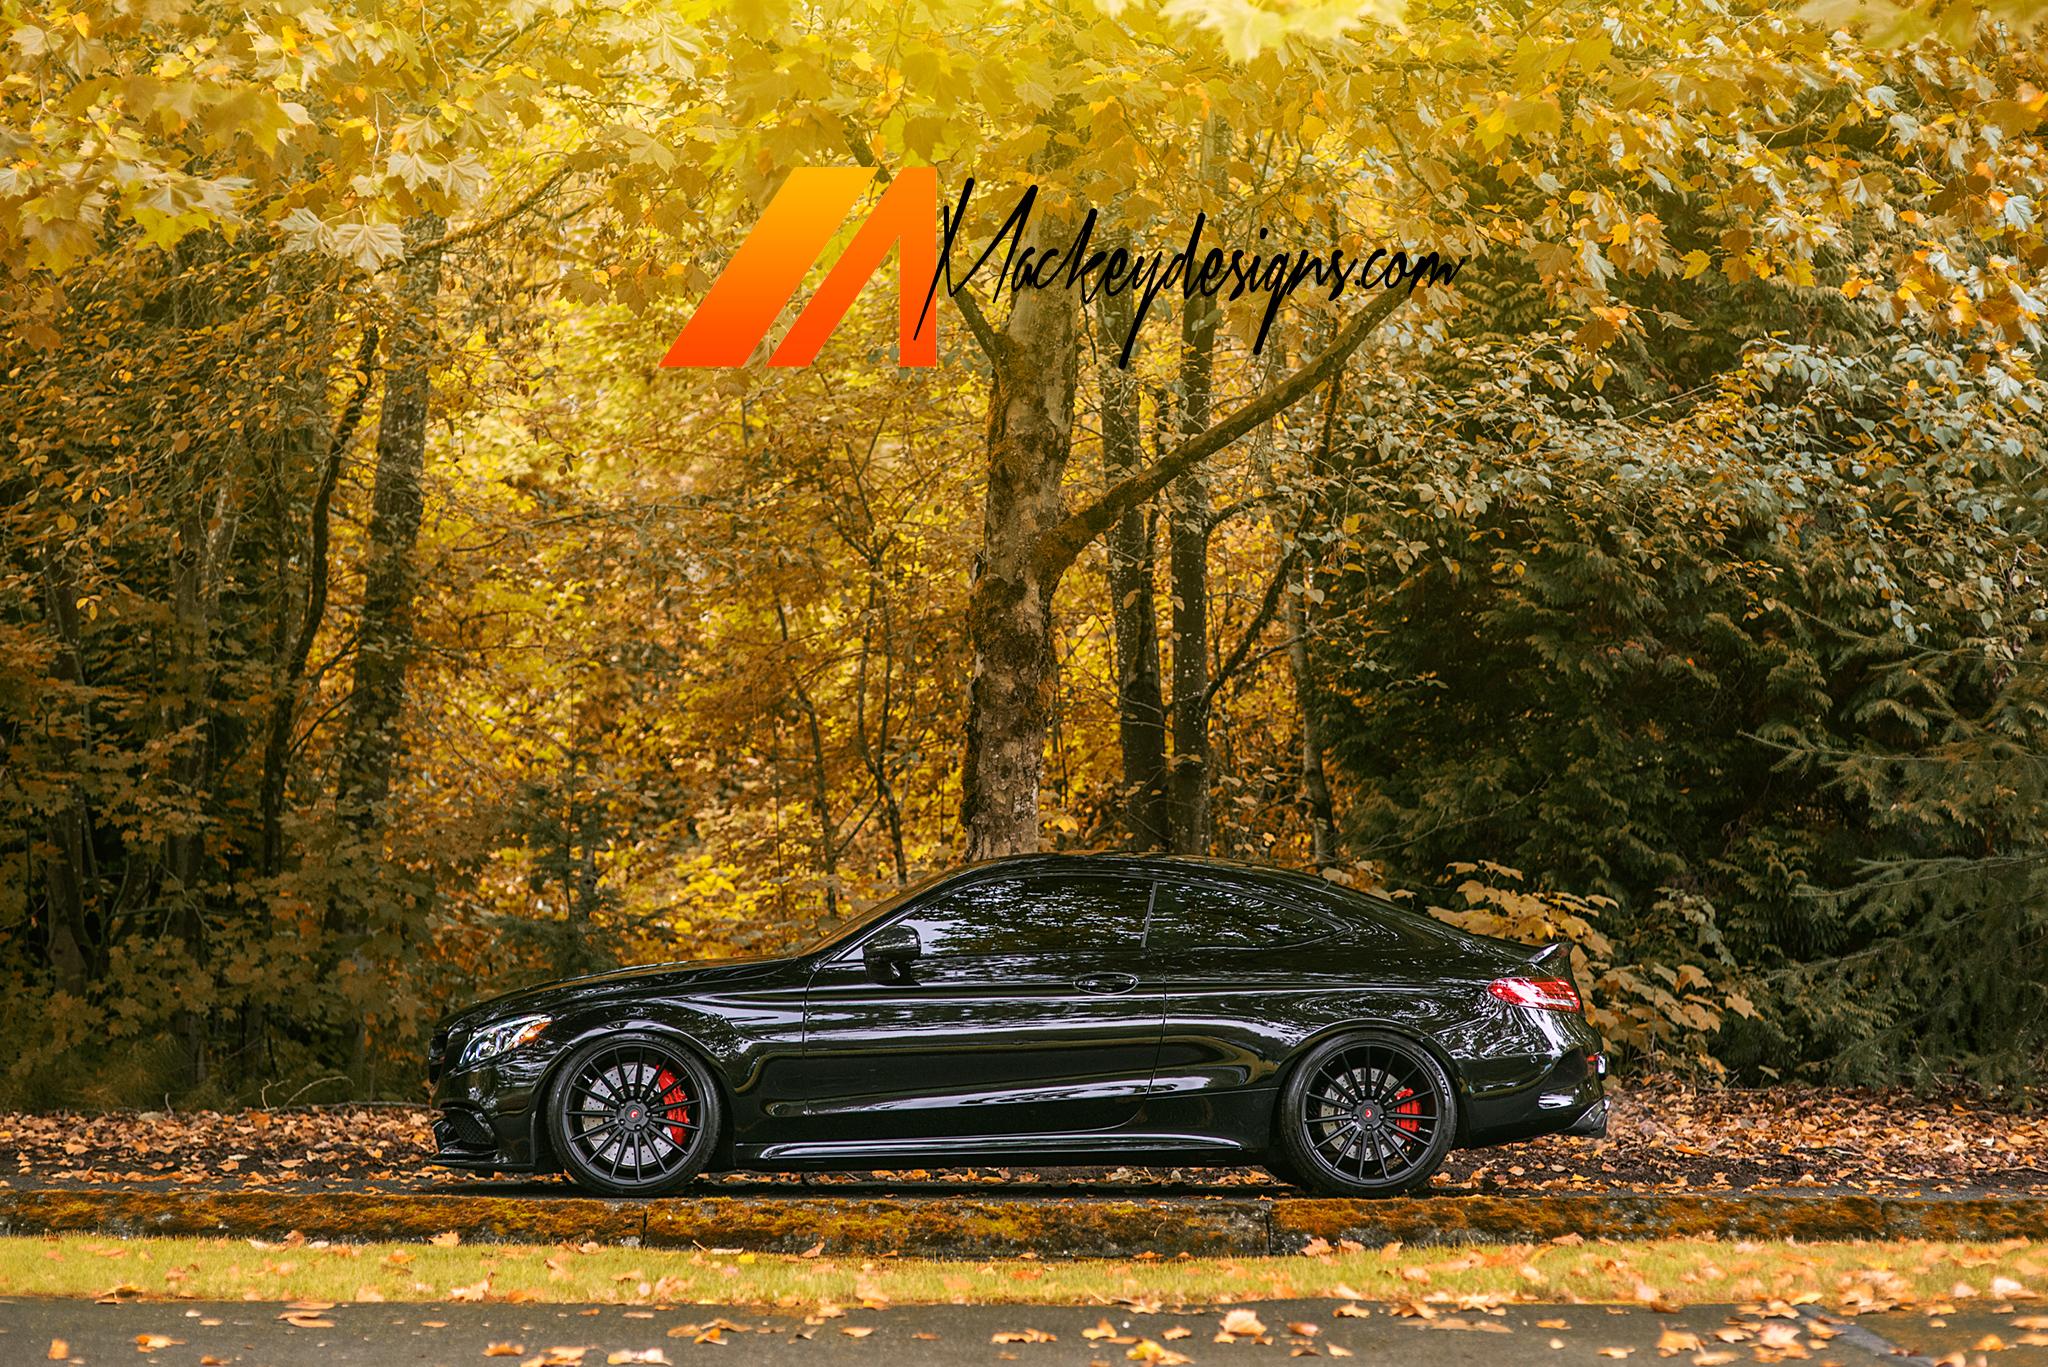 Mackeydesigns_Mercedes_C63S-10.jpg